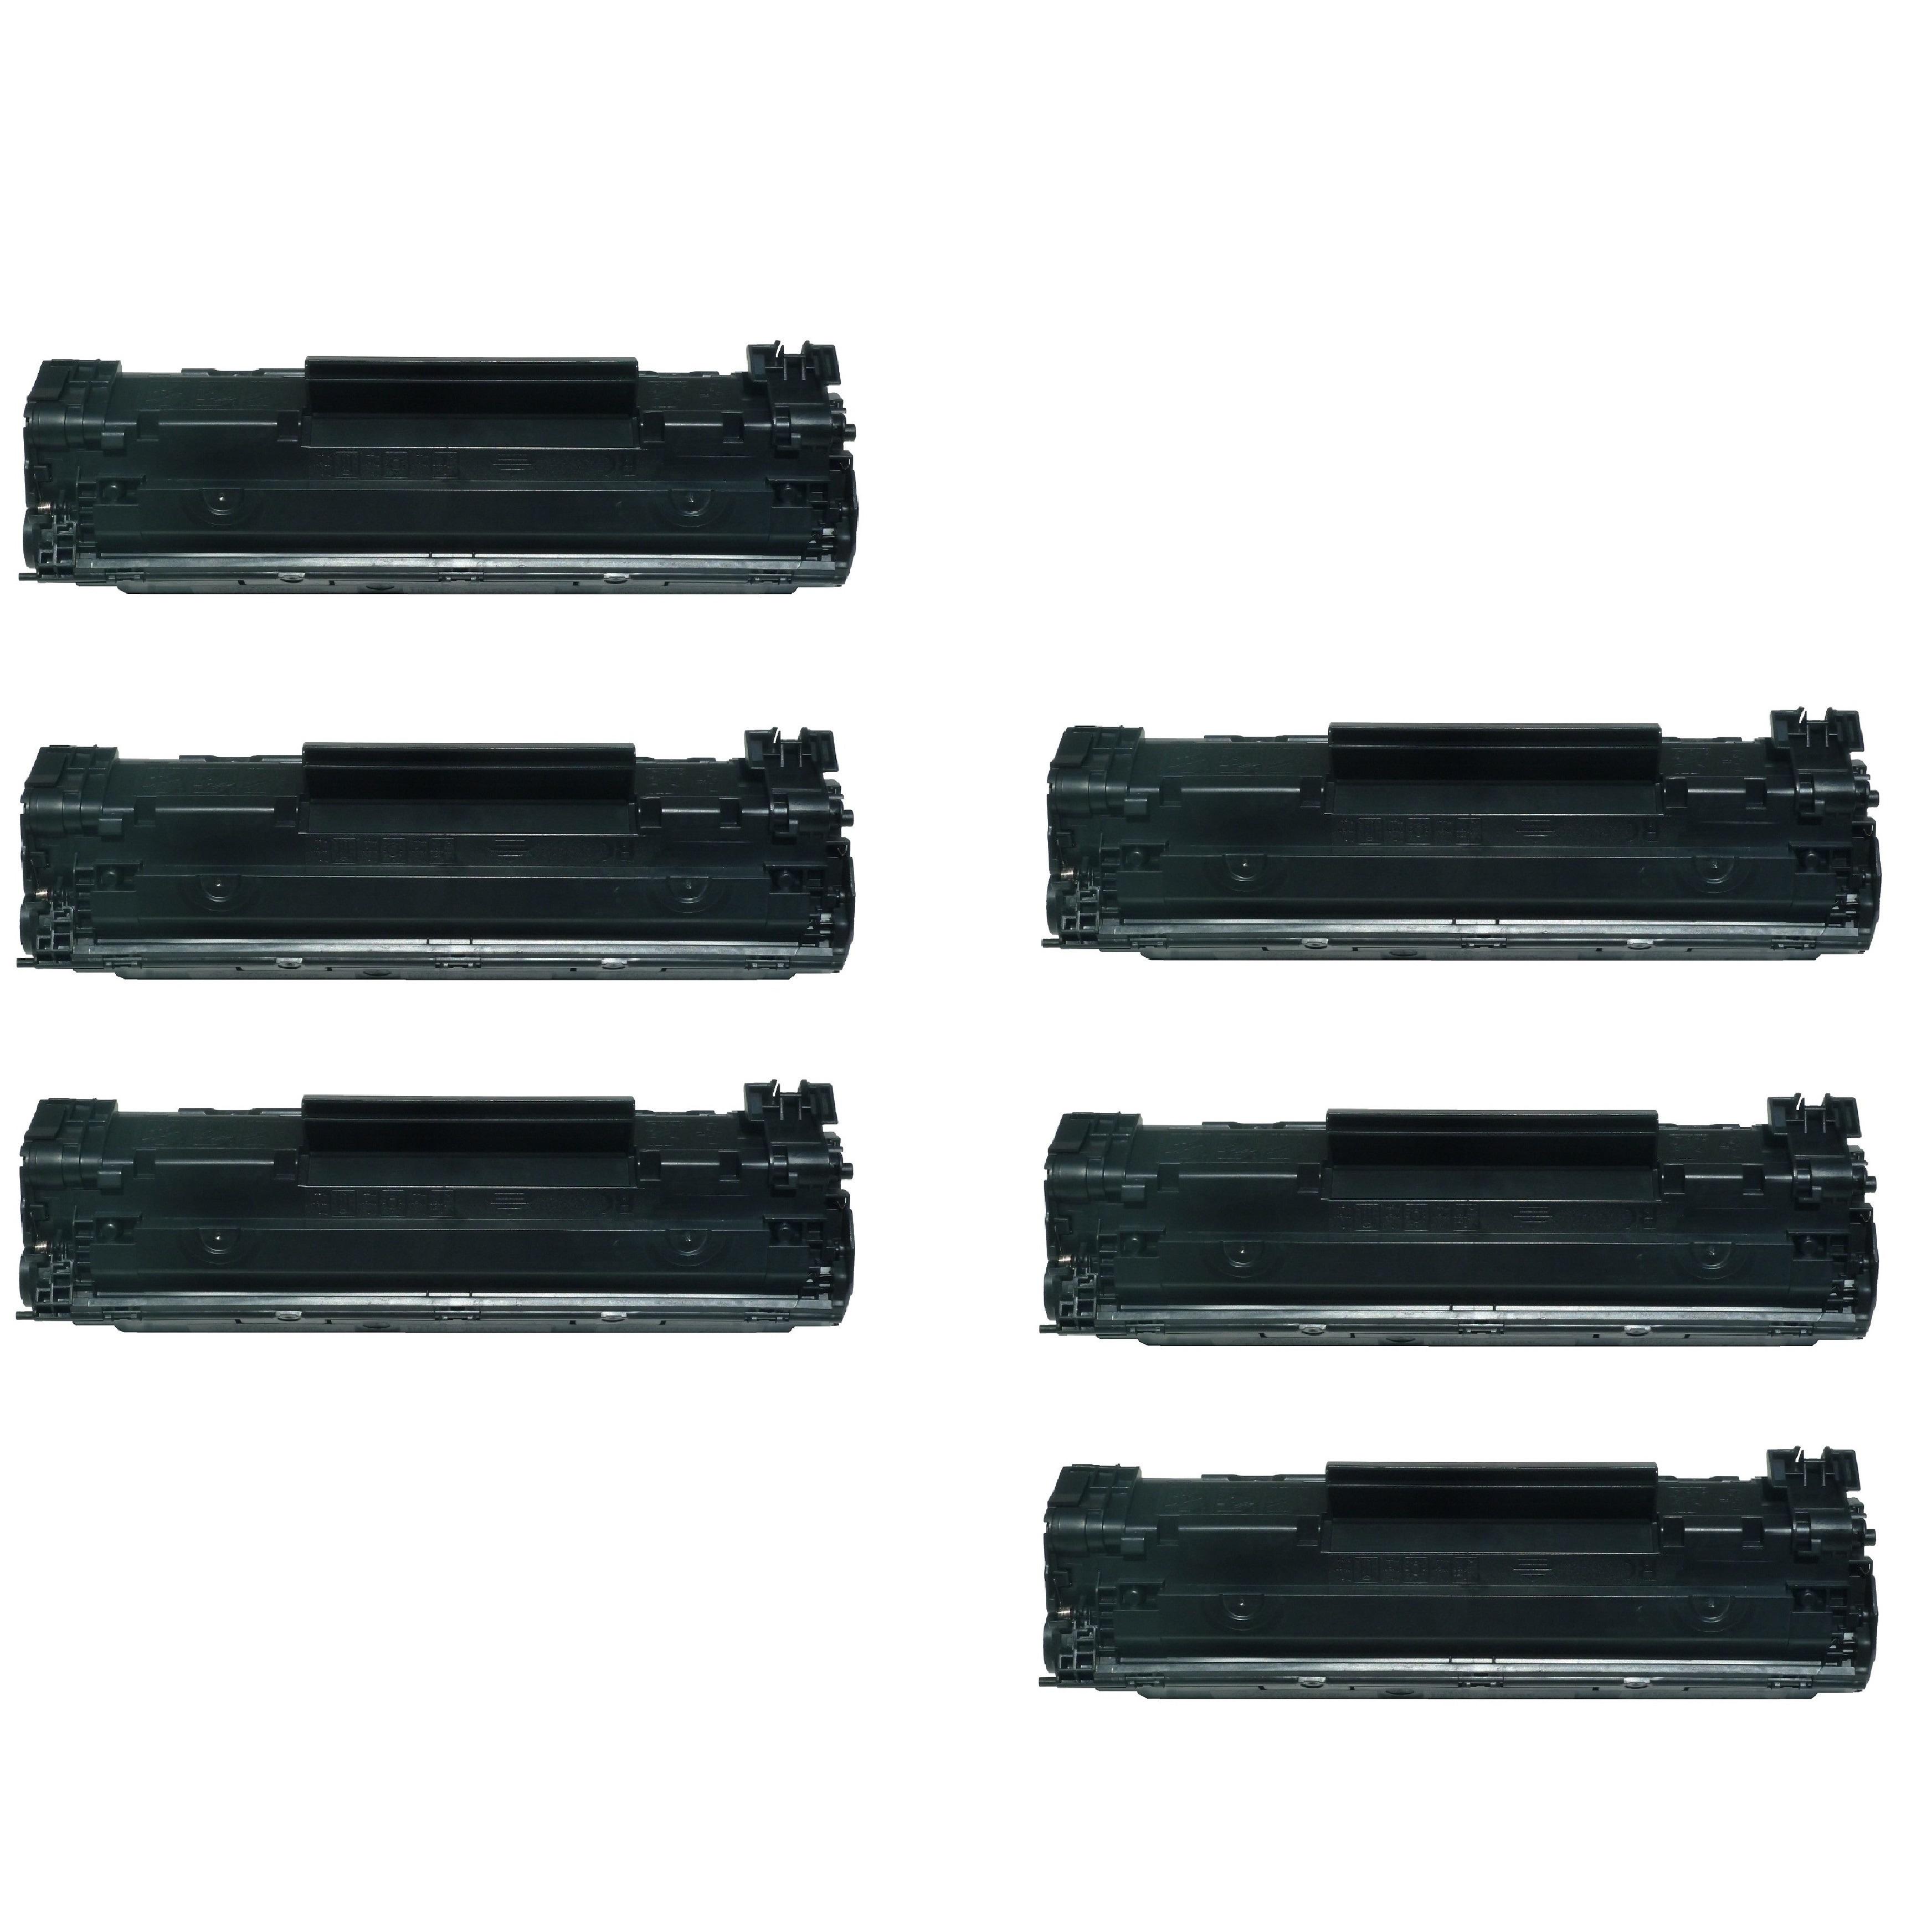 Shop Compatible Hp 85a Ce285a Toner Laserjet M1132 M1212 M1217 Ce 285a P1102 M1130 M1134 M1136 M1137 M1138 Pack Of 6 Free Shipping Today